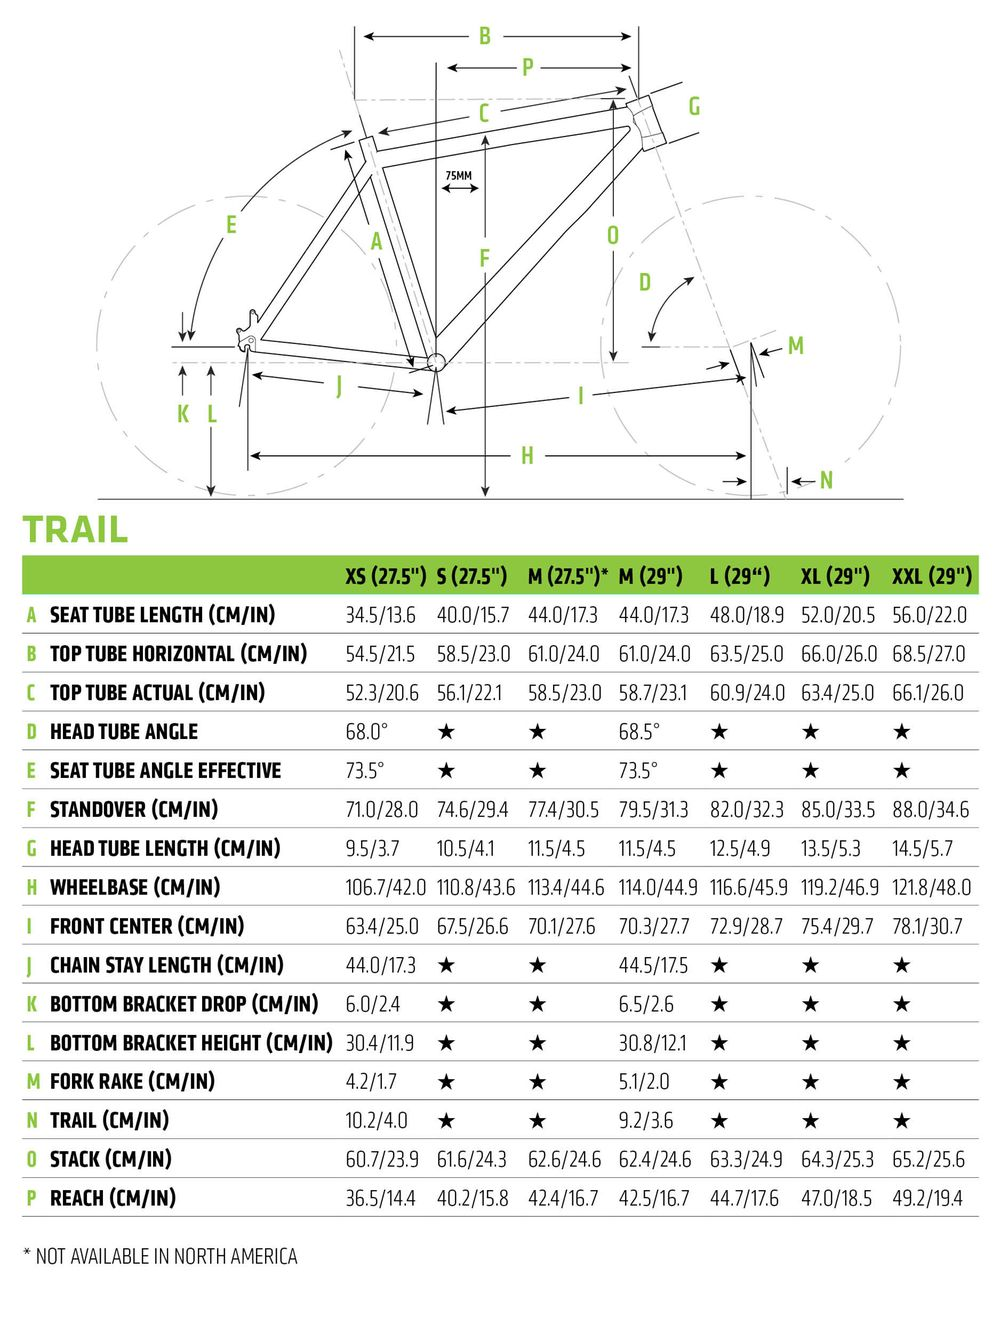 Trail 6 -